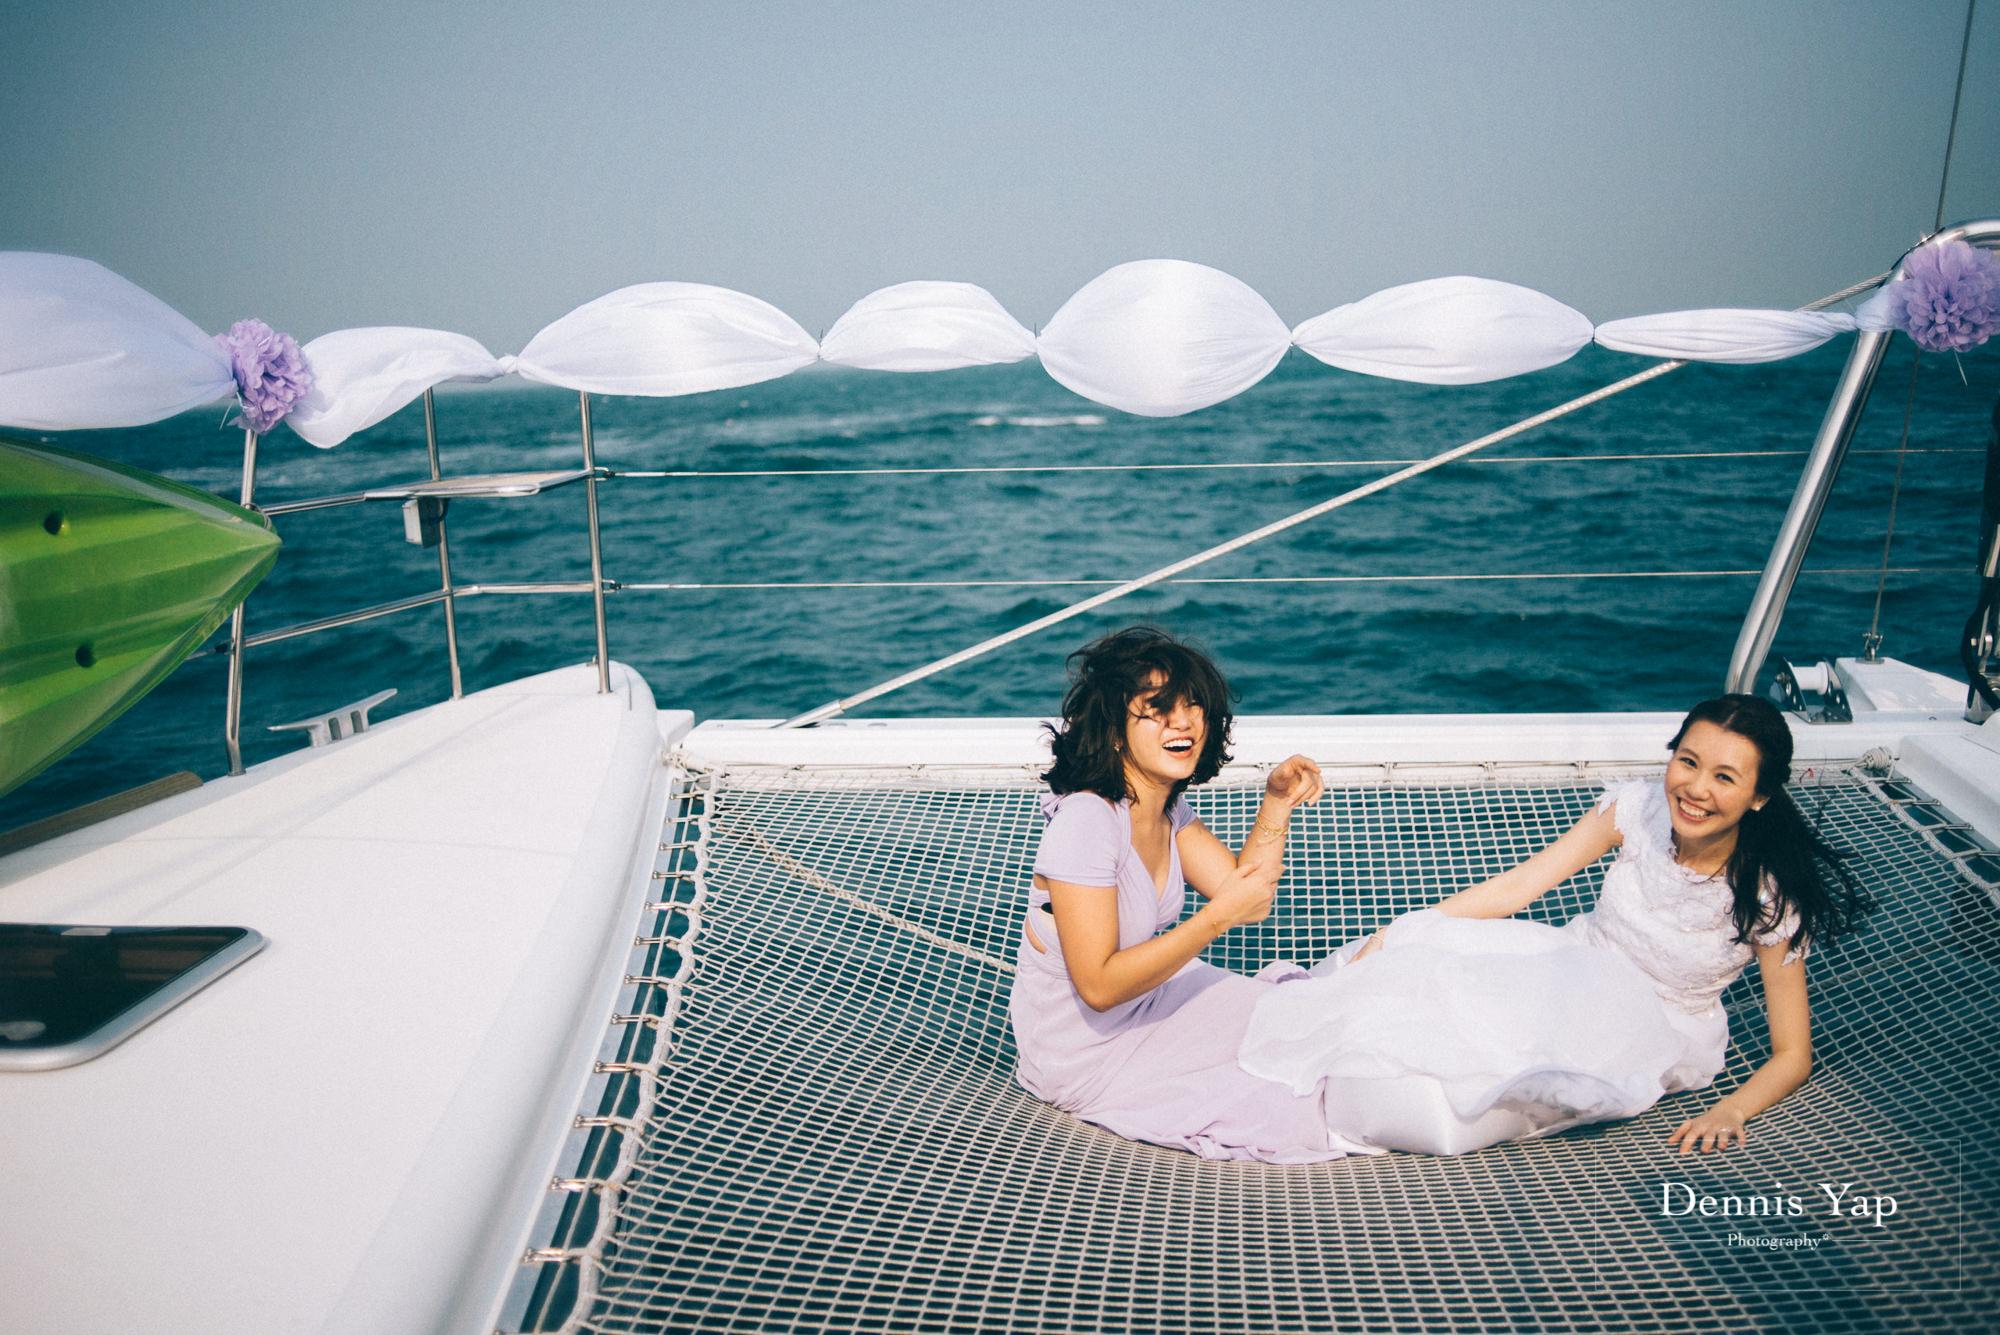 danny sherine wedding reception registration of marriage yacht fun beloved sea dennis yap photography malaysia top wedding photographer-30.jpg